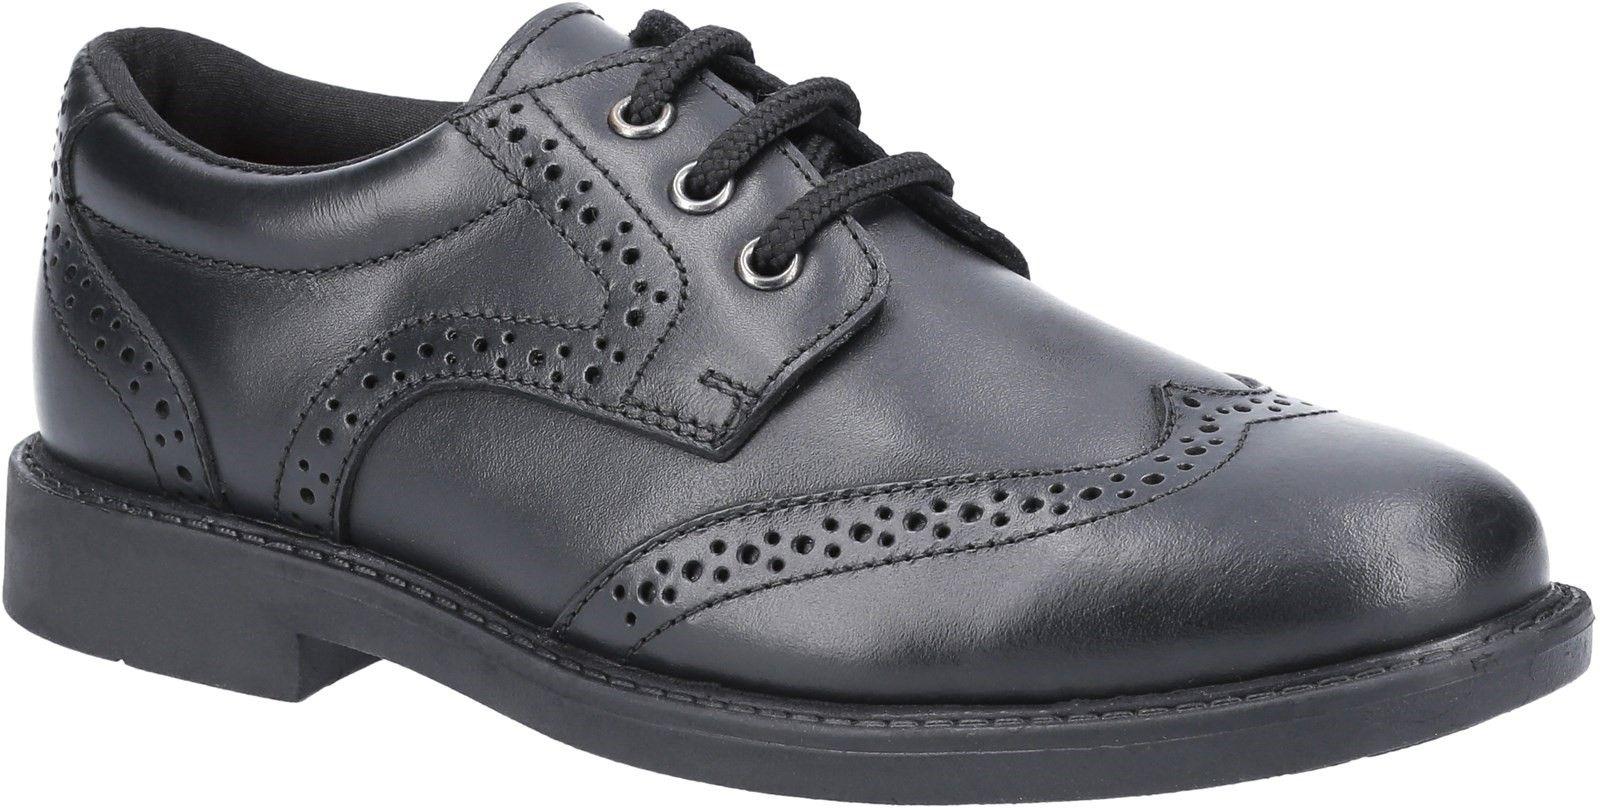 Harry Senior School Shoe